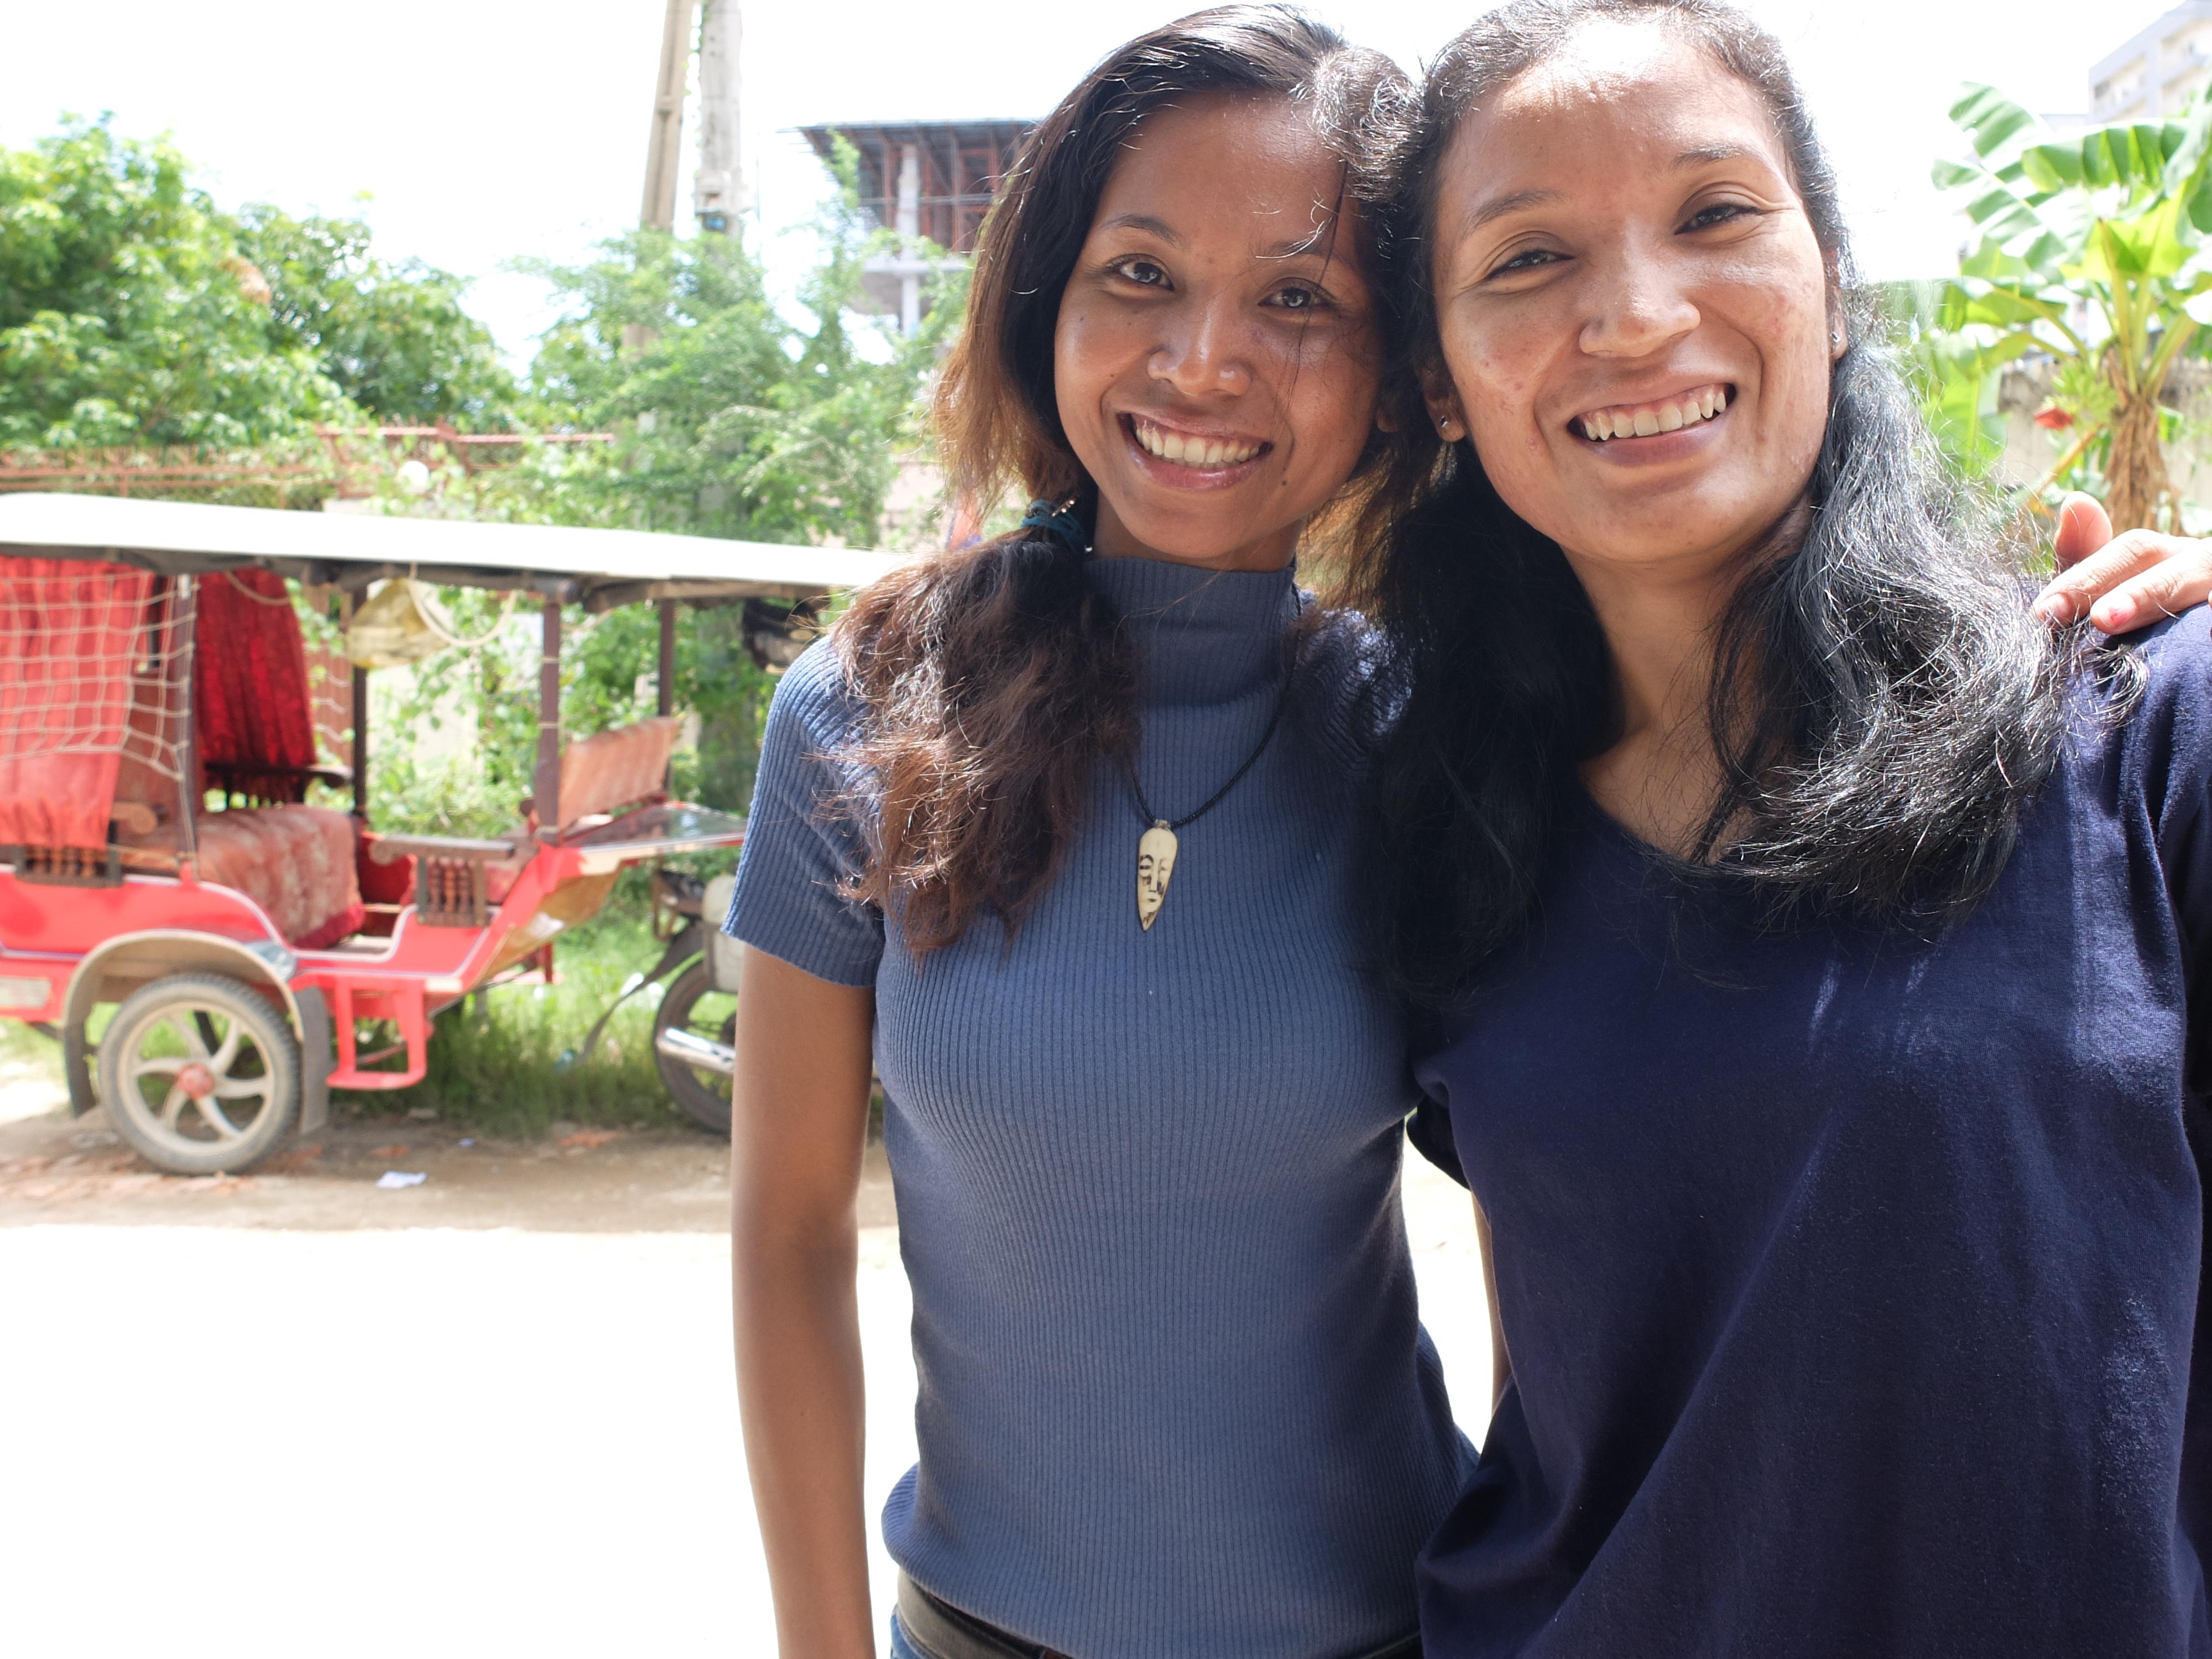 Cambodia – The Activists